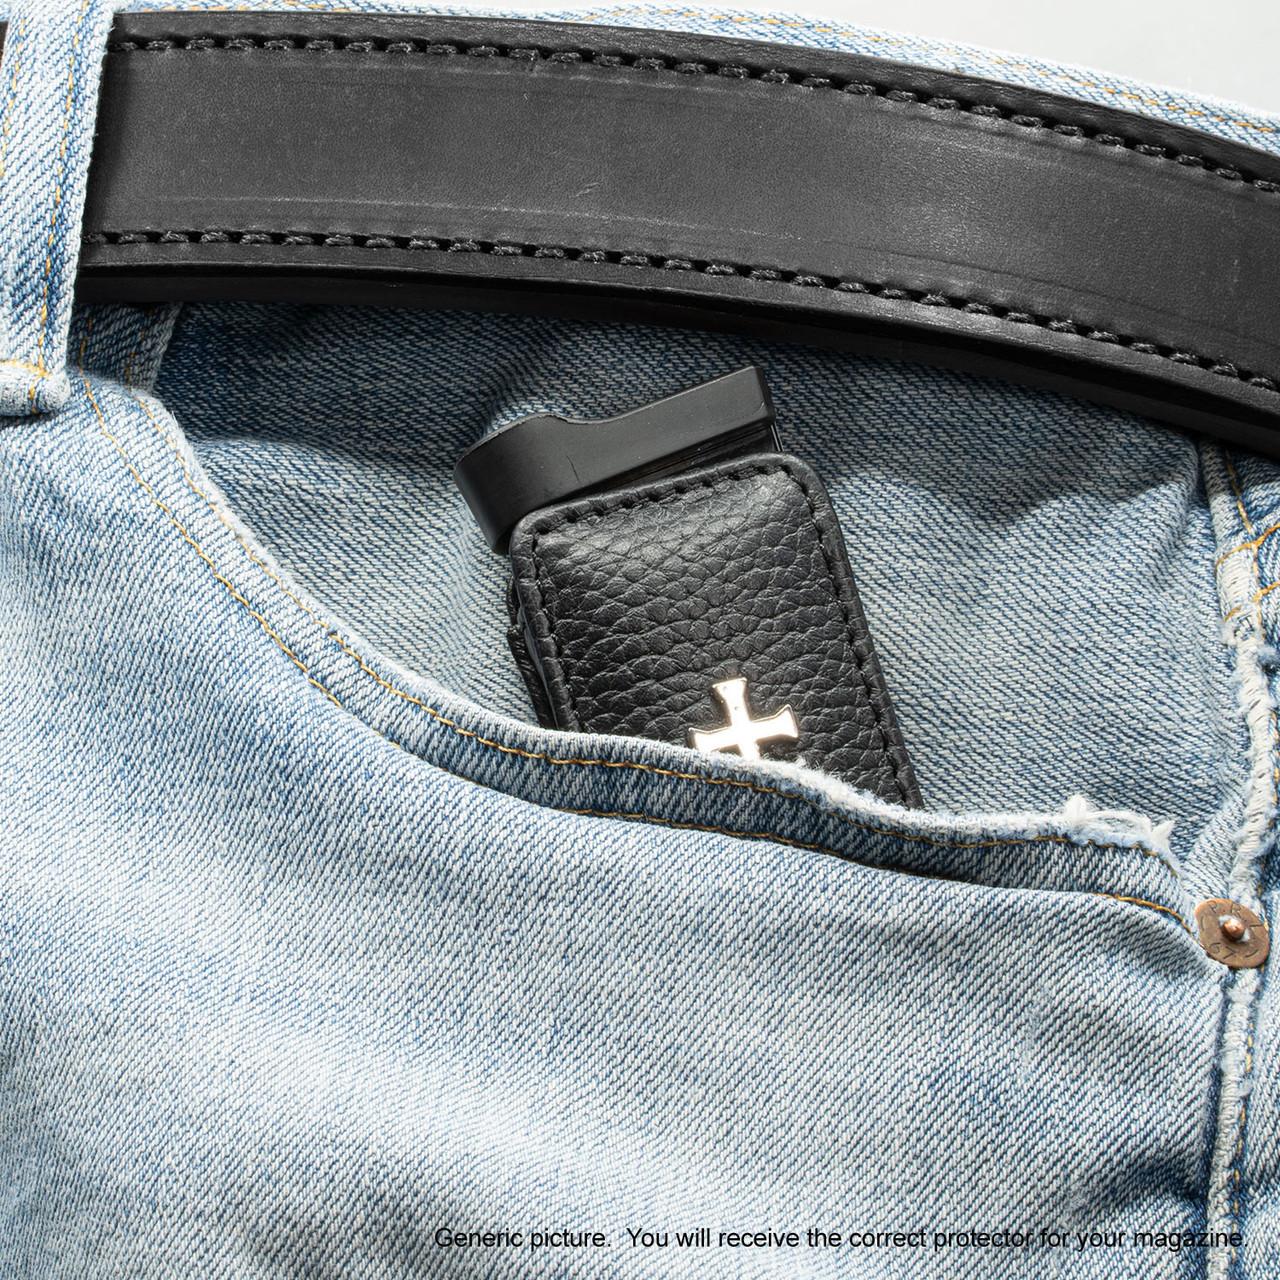 Keltec P3AT Black Leather Cross Magazine Pocket Protector